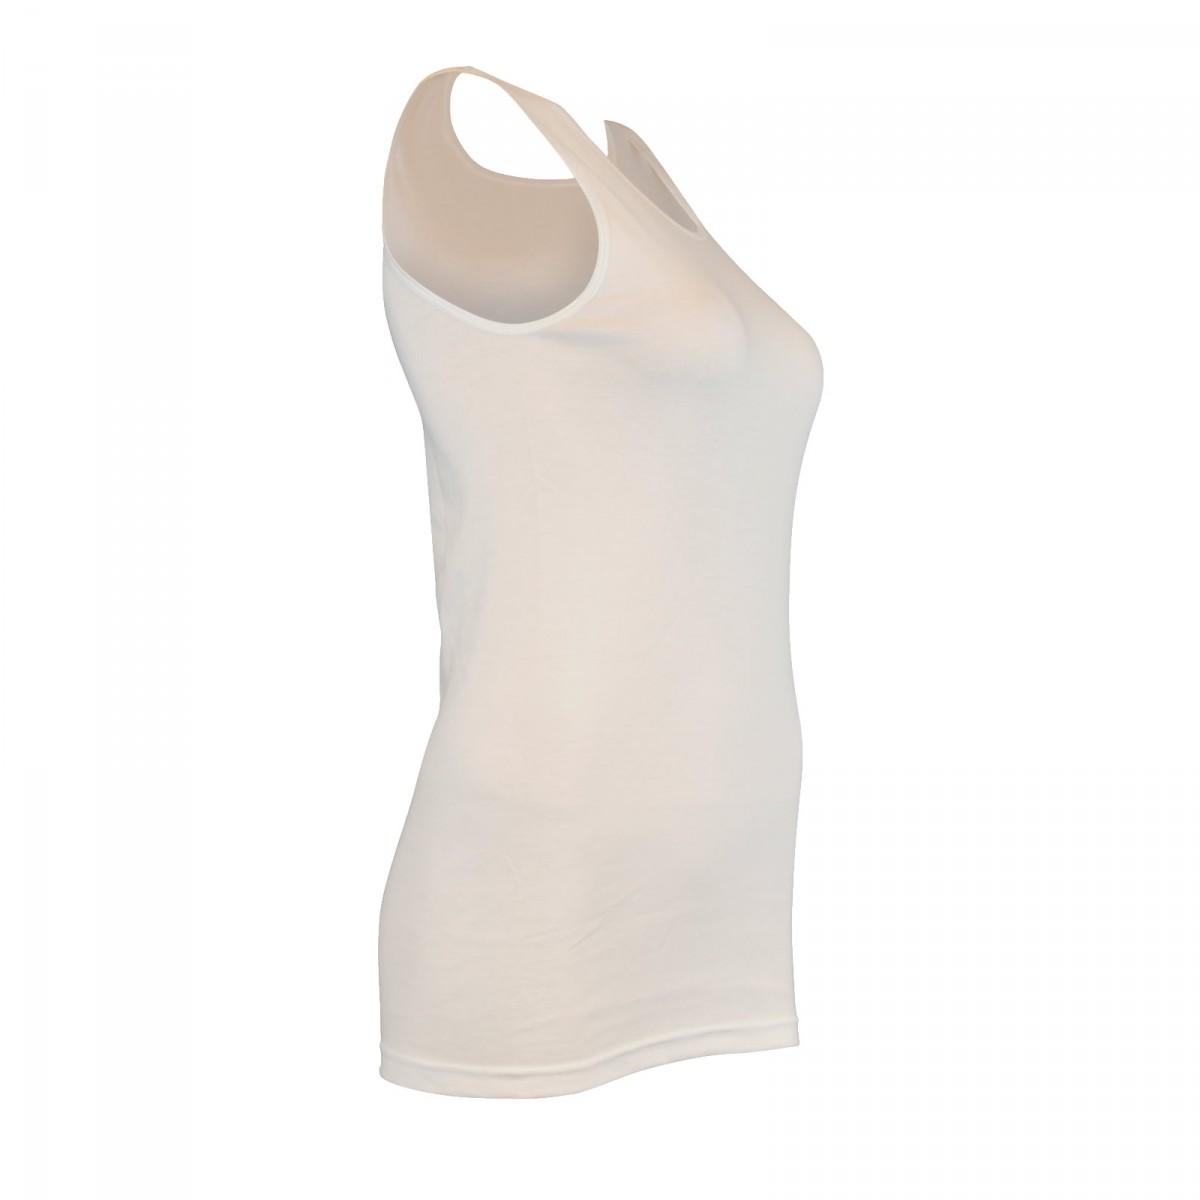 check out 53891 781ec 4 Stück Damen Unterhemden Vollachsel Baumwolle weiß 30511